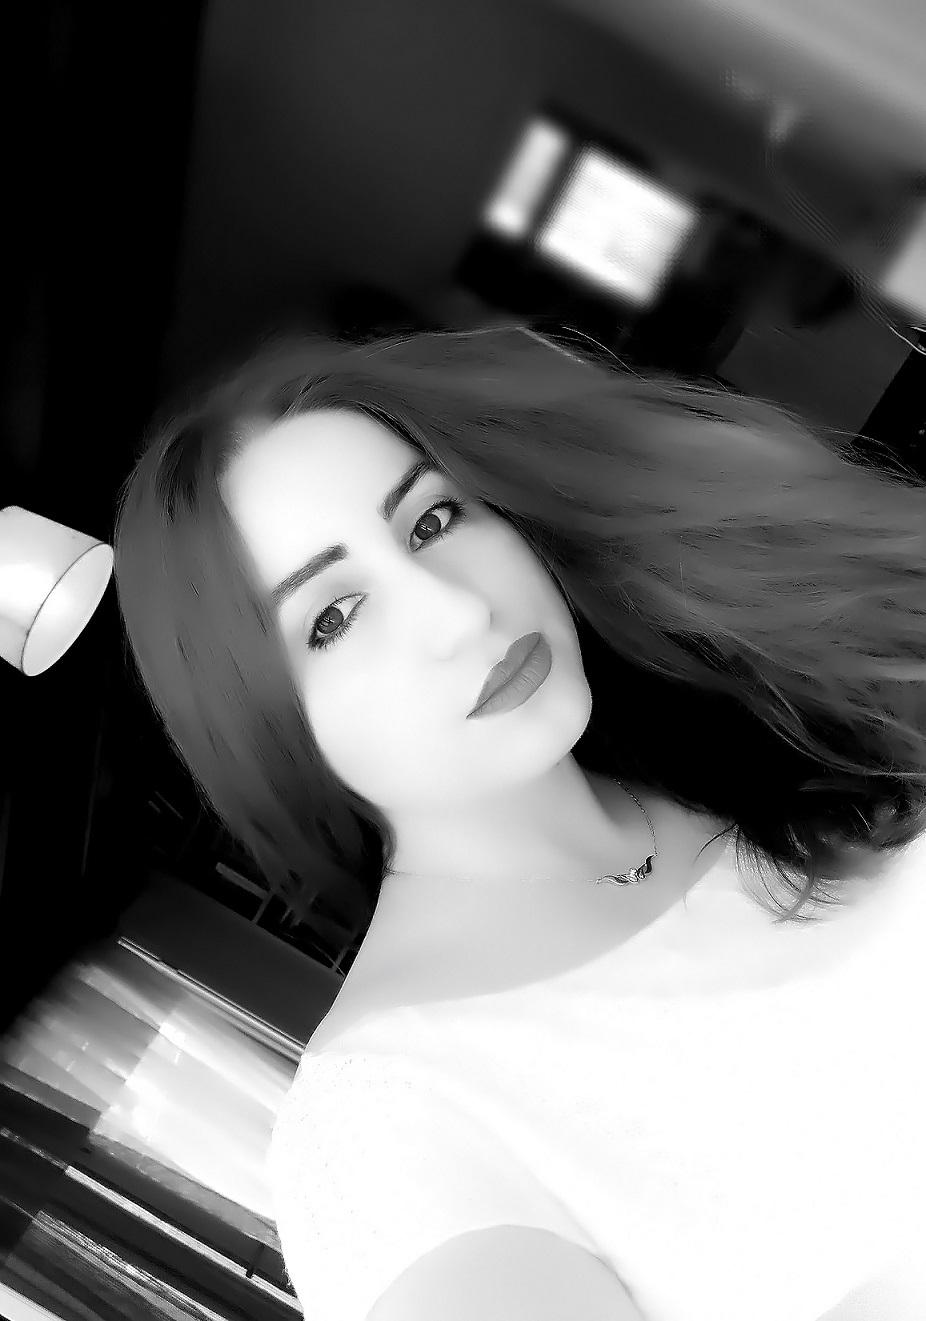 lorena-stroka-foto-biografia-wikipedia-gazetare-instagram-facebook-linkedin-mosha-gjatesia-kontakt-blog-albstroka